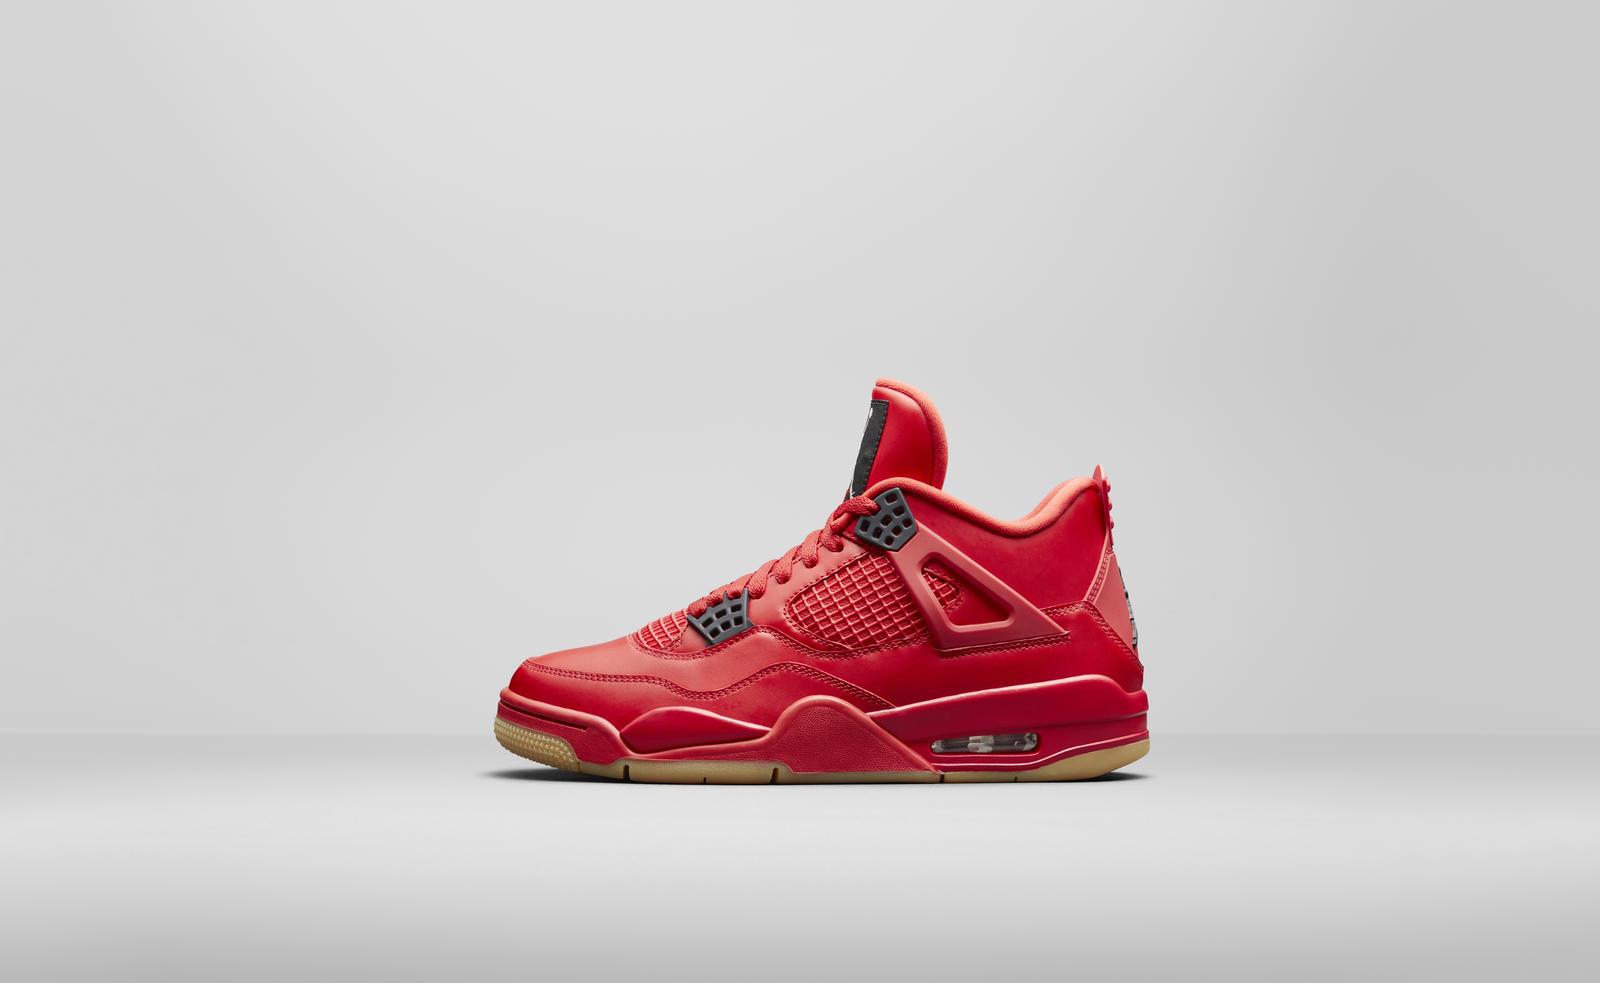 Air Jordan 4 NRG fire Red womens